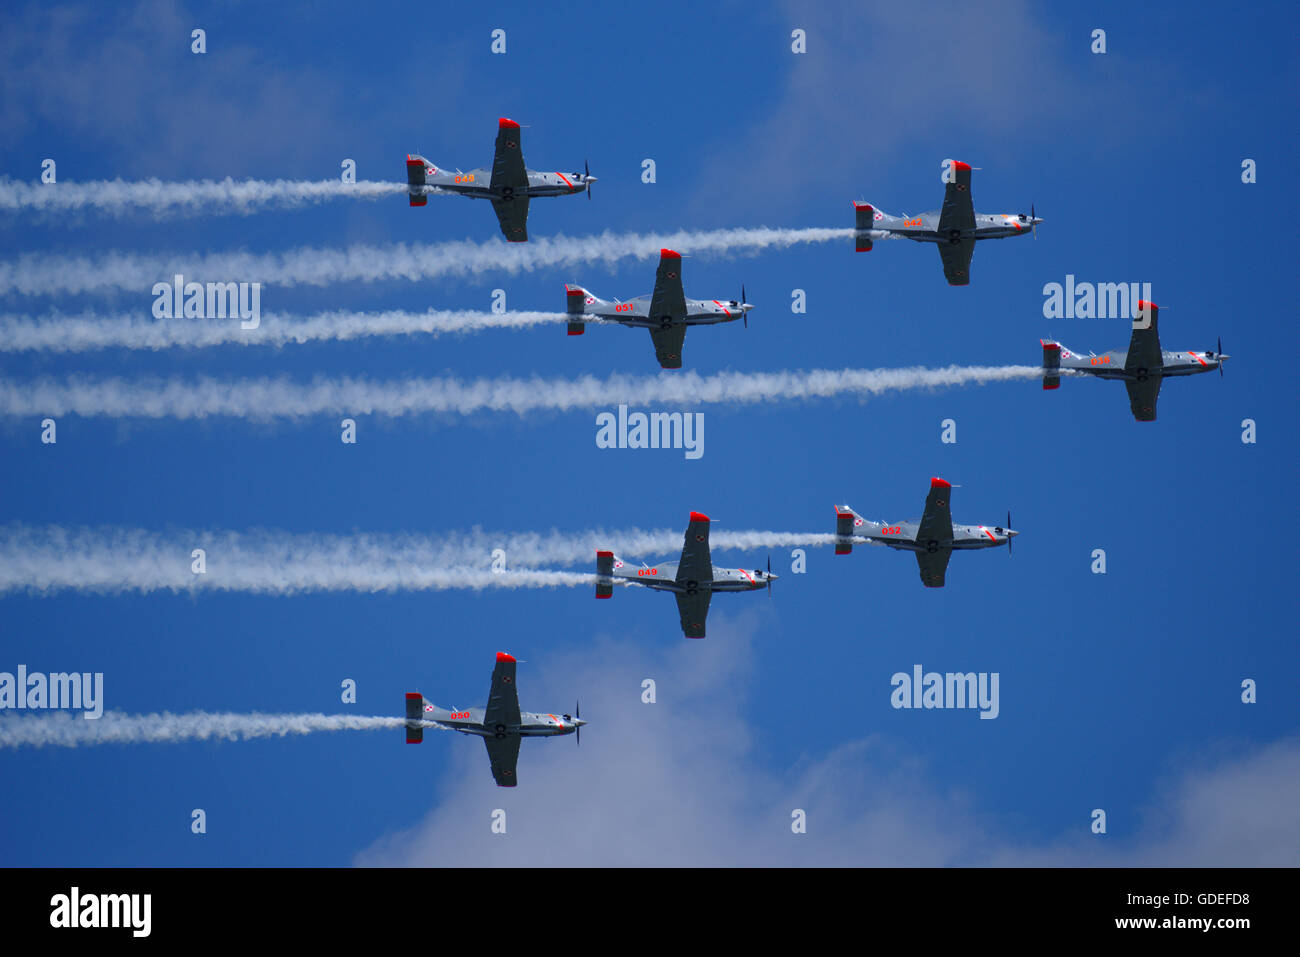 Orlik Aerobatic Team of the Polish Air Force at RAF Fairford RIAT - Stock Image